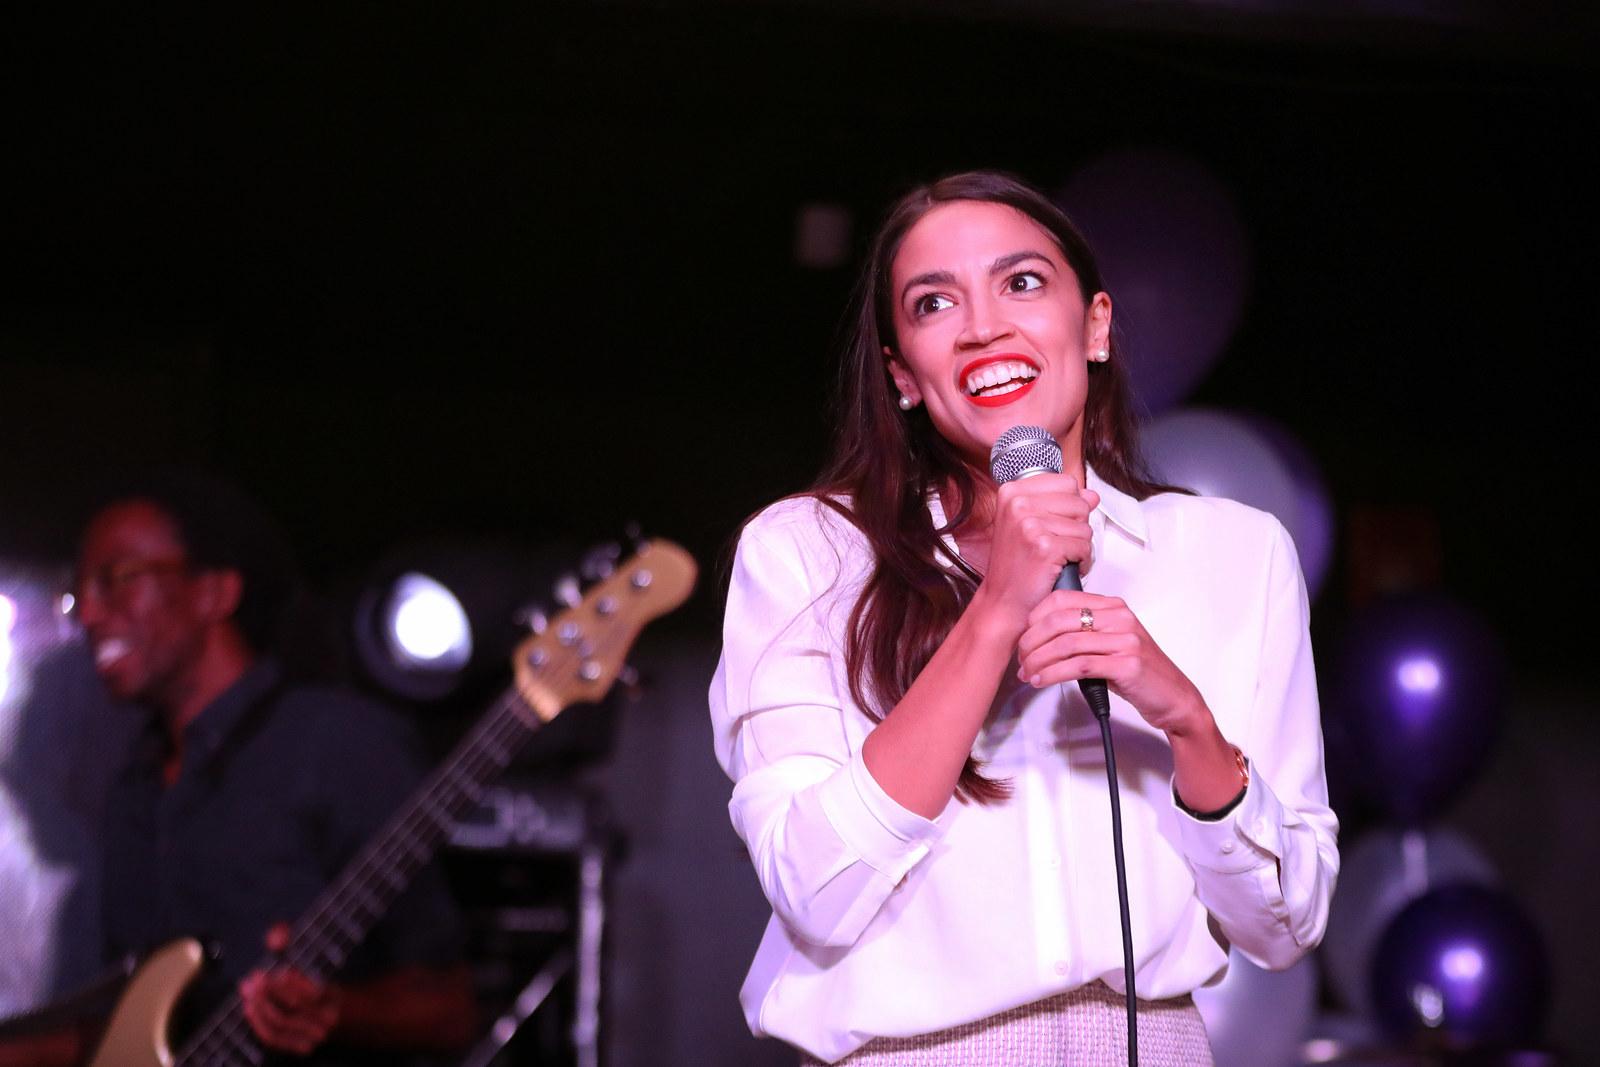 Alexandria Ocasio-Cortez addresses the crowd gathered at La Boom night club in Queens on Nov. 6, 2018, in New York City.